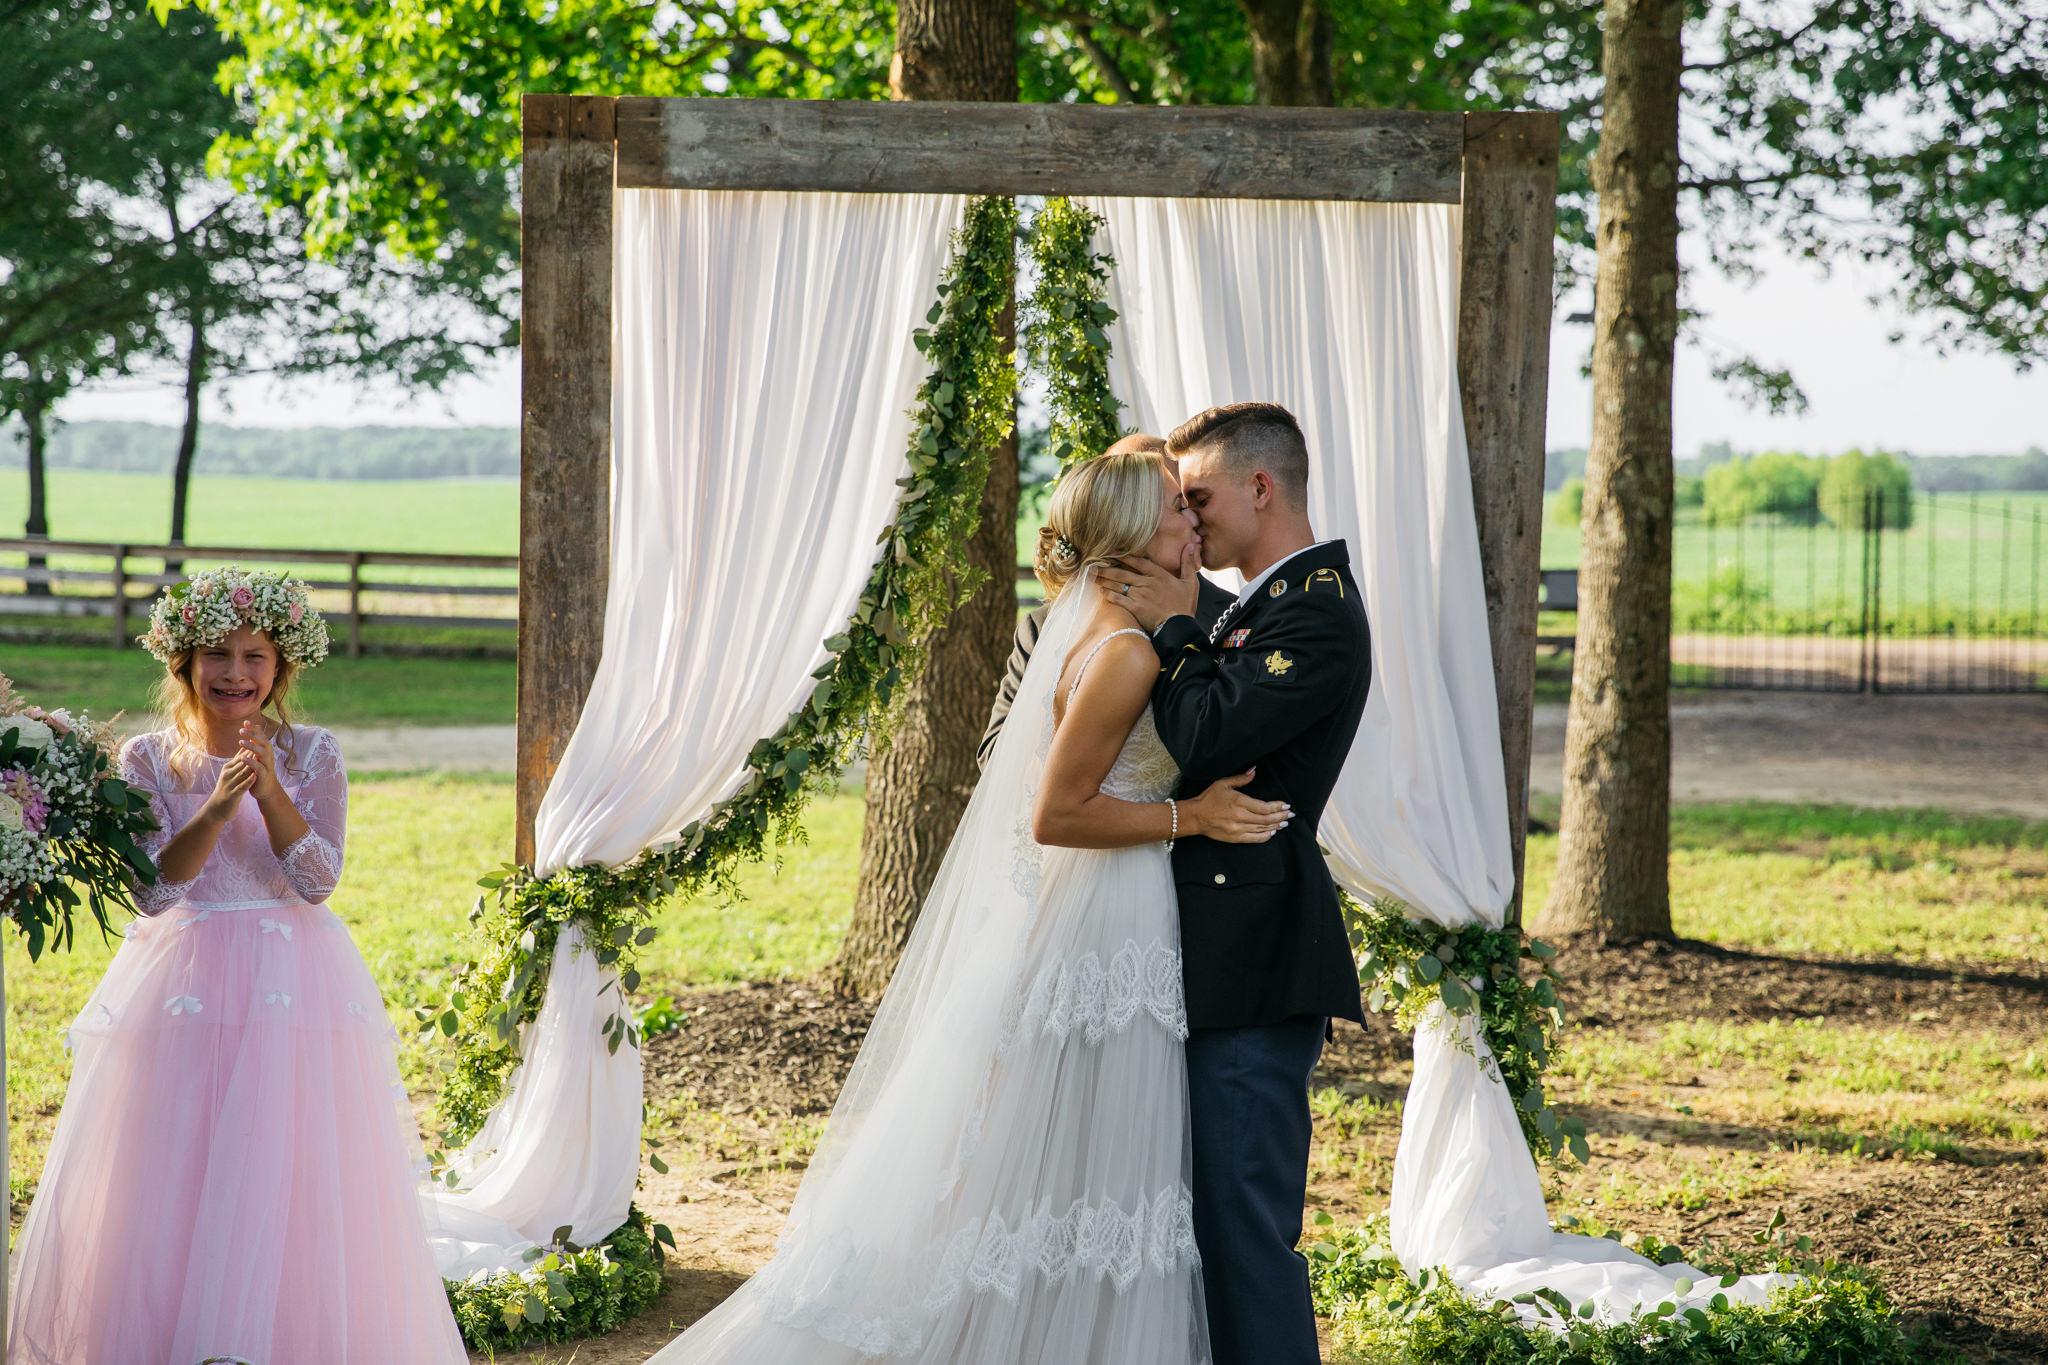 backyard-wedding-thewarmtharoundyou-lexy-branson-56.jpg